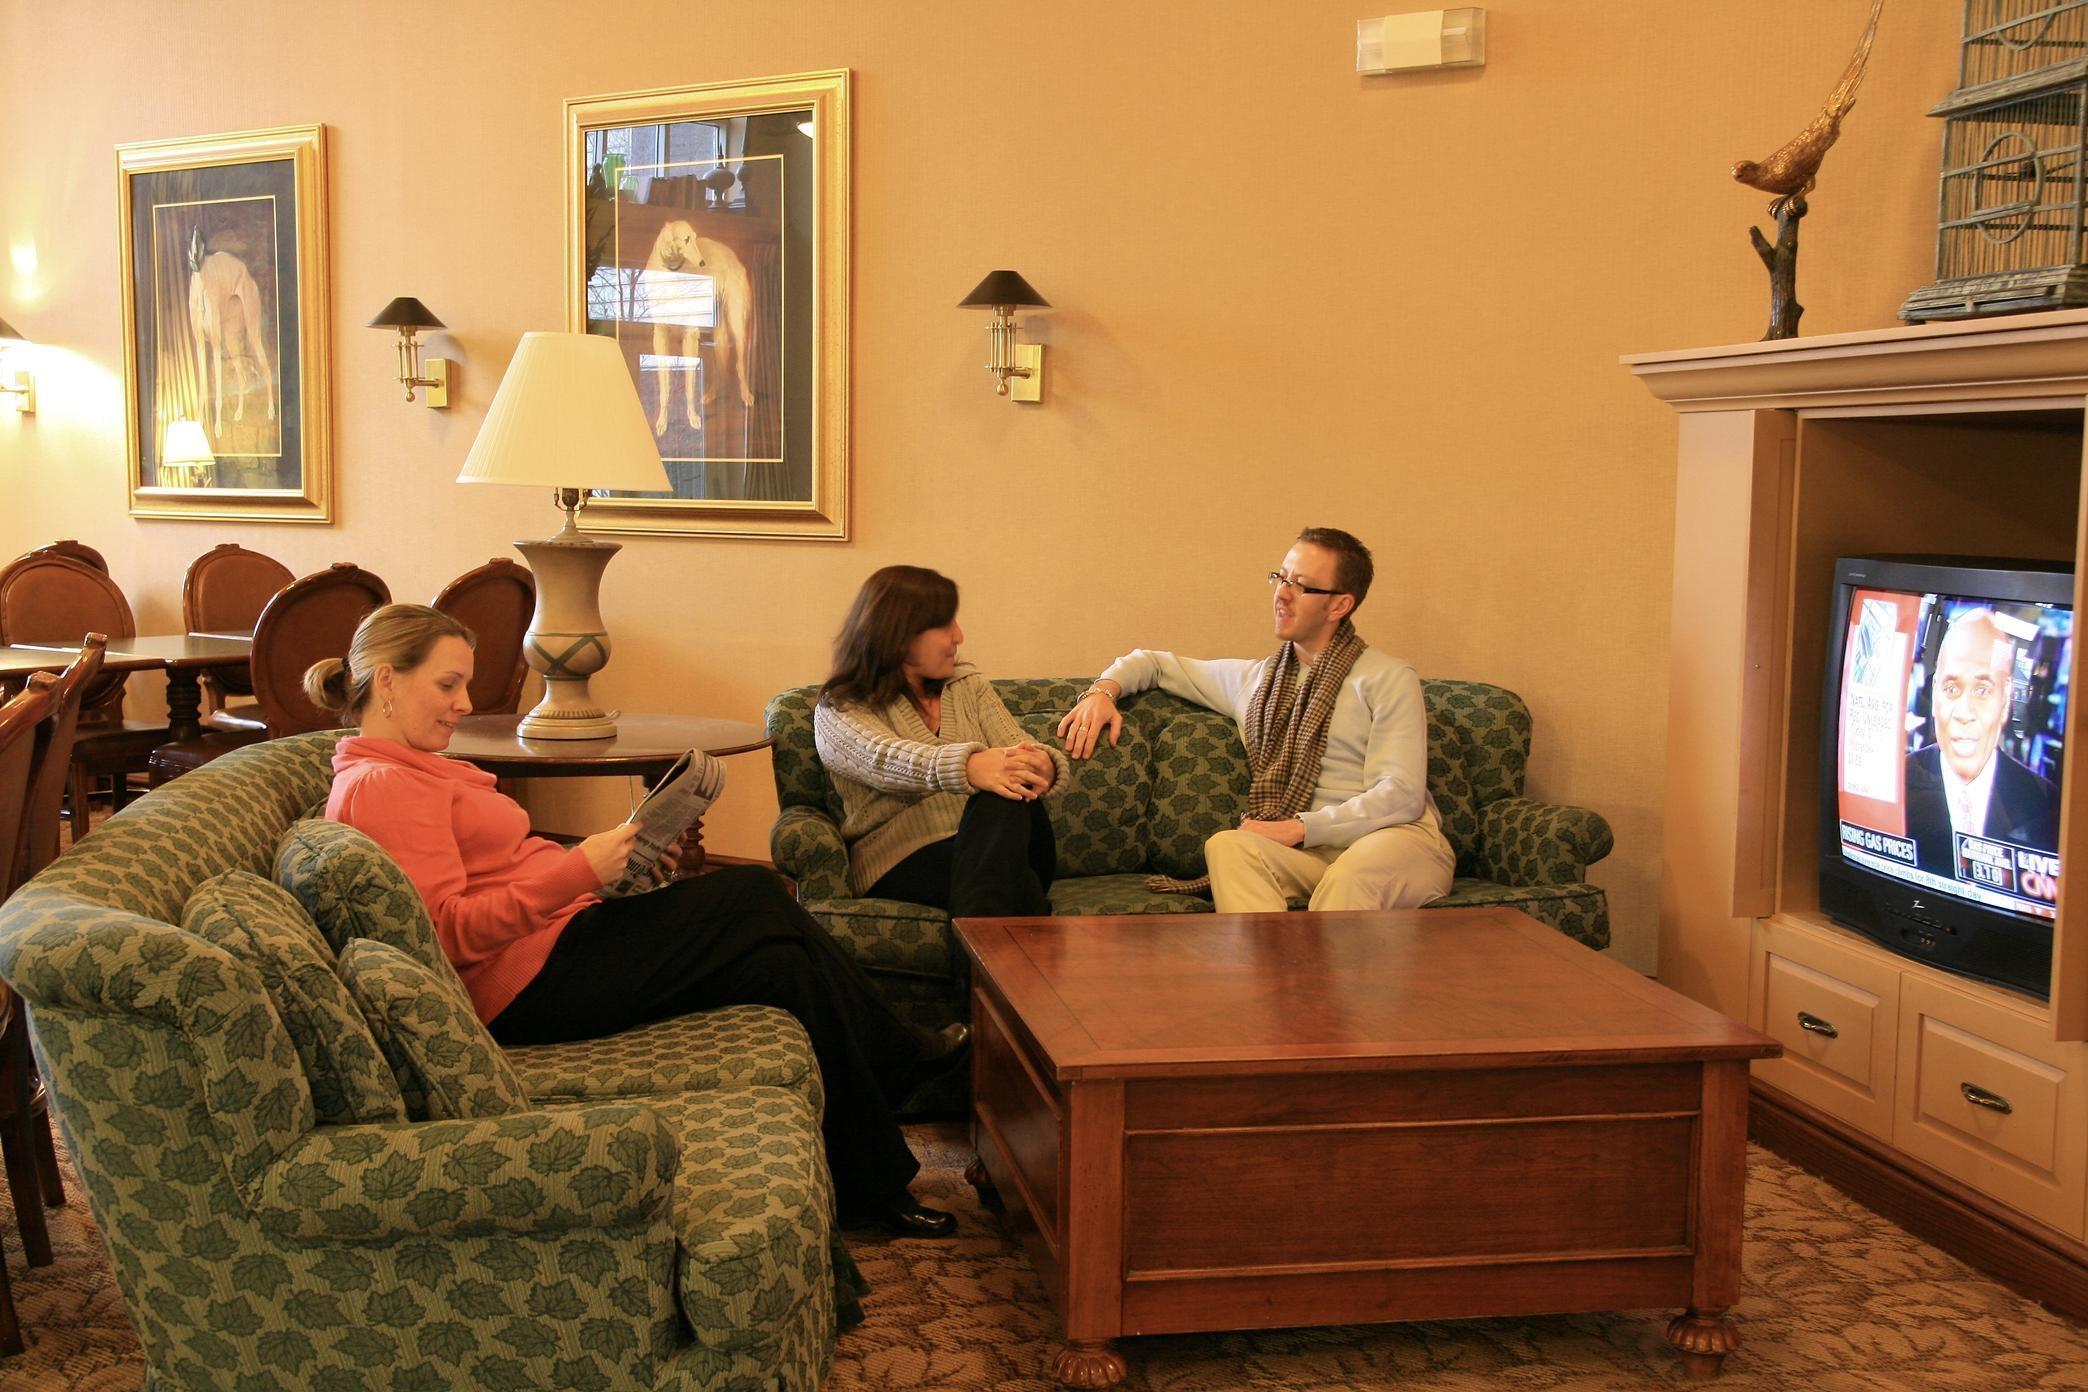 Hampton Inn & Suites Newtown image 4